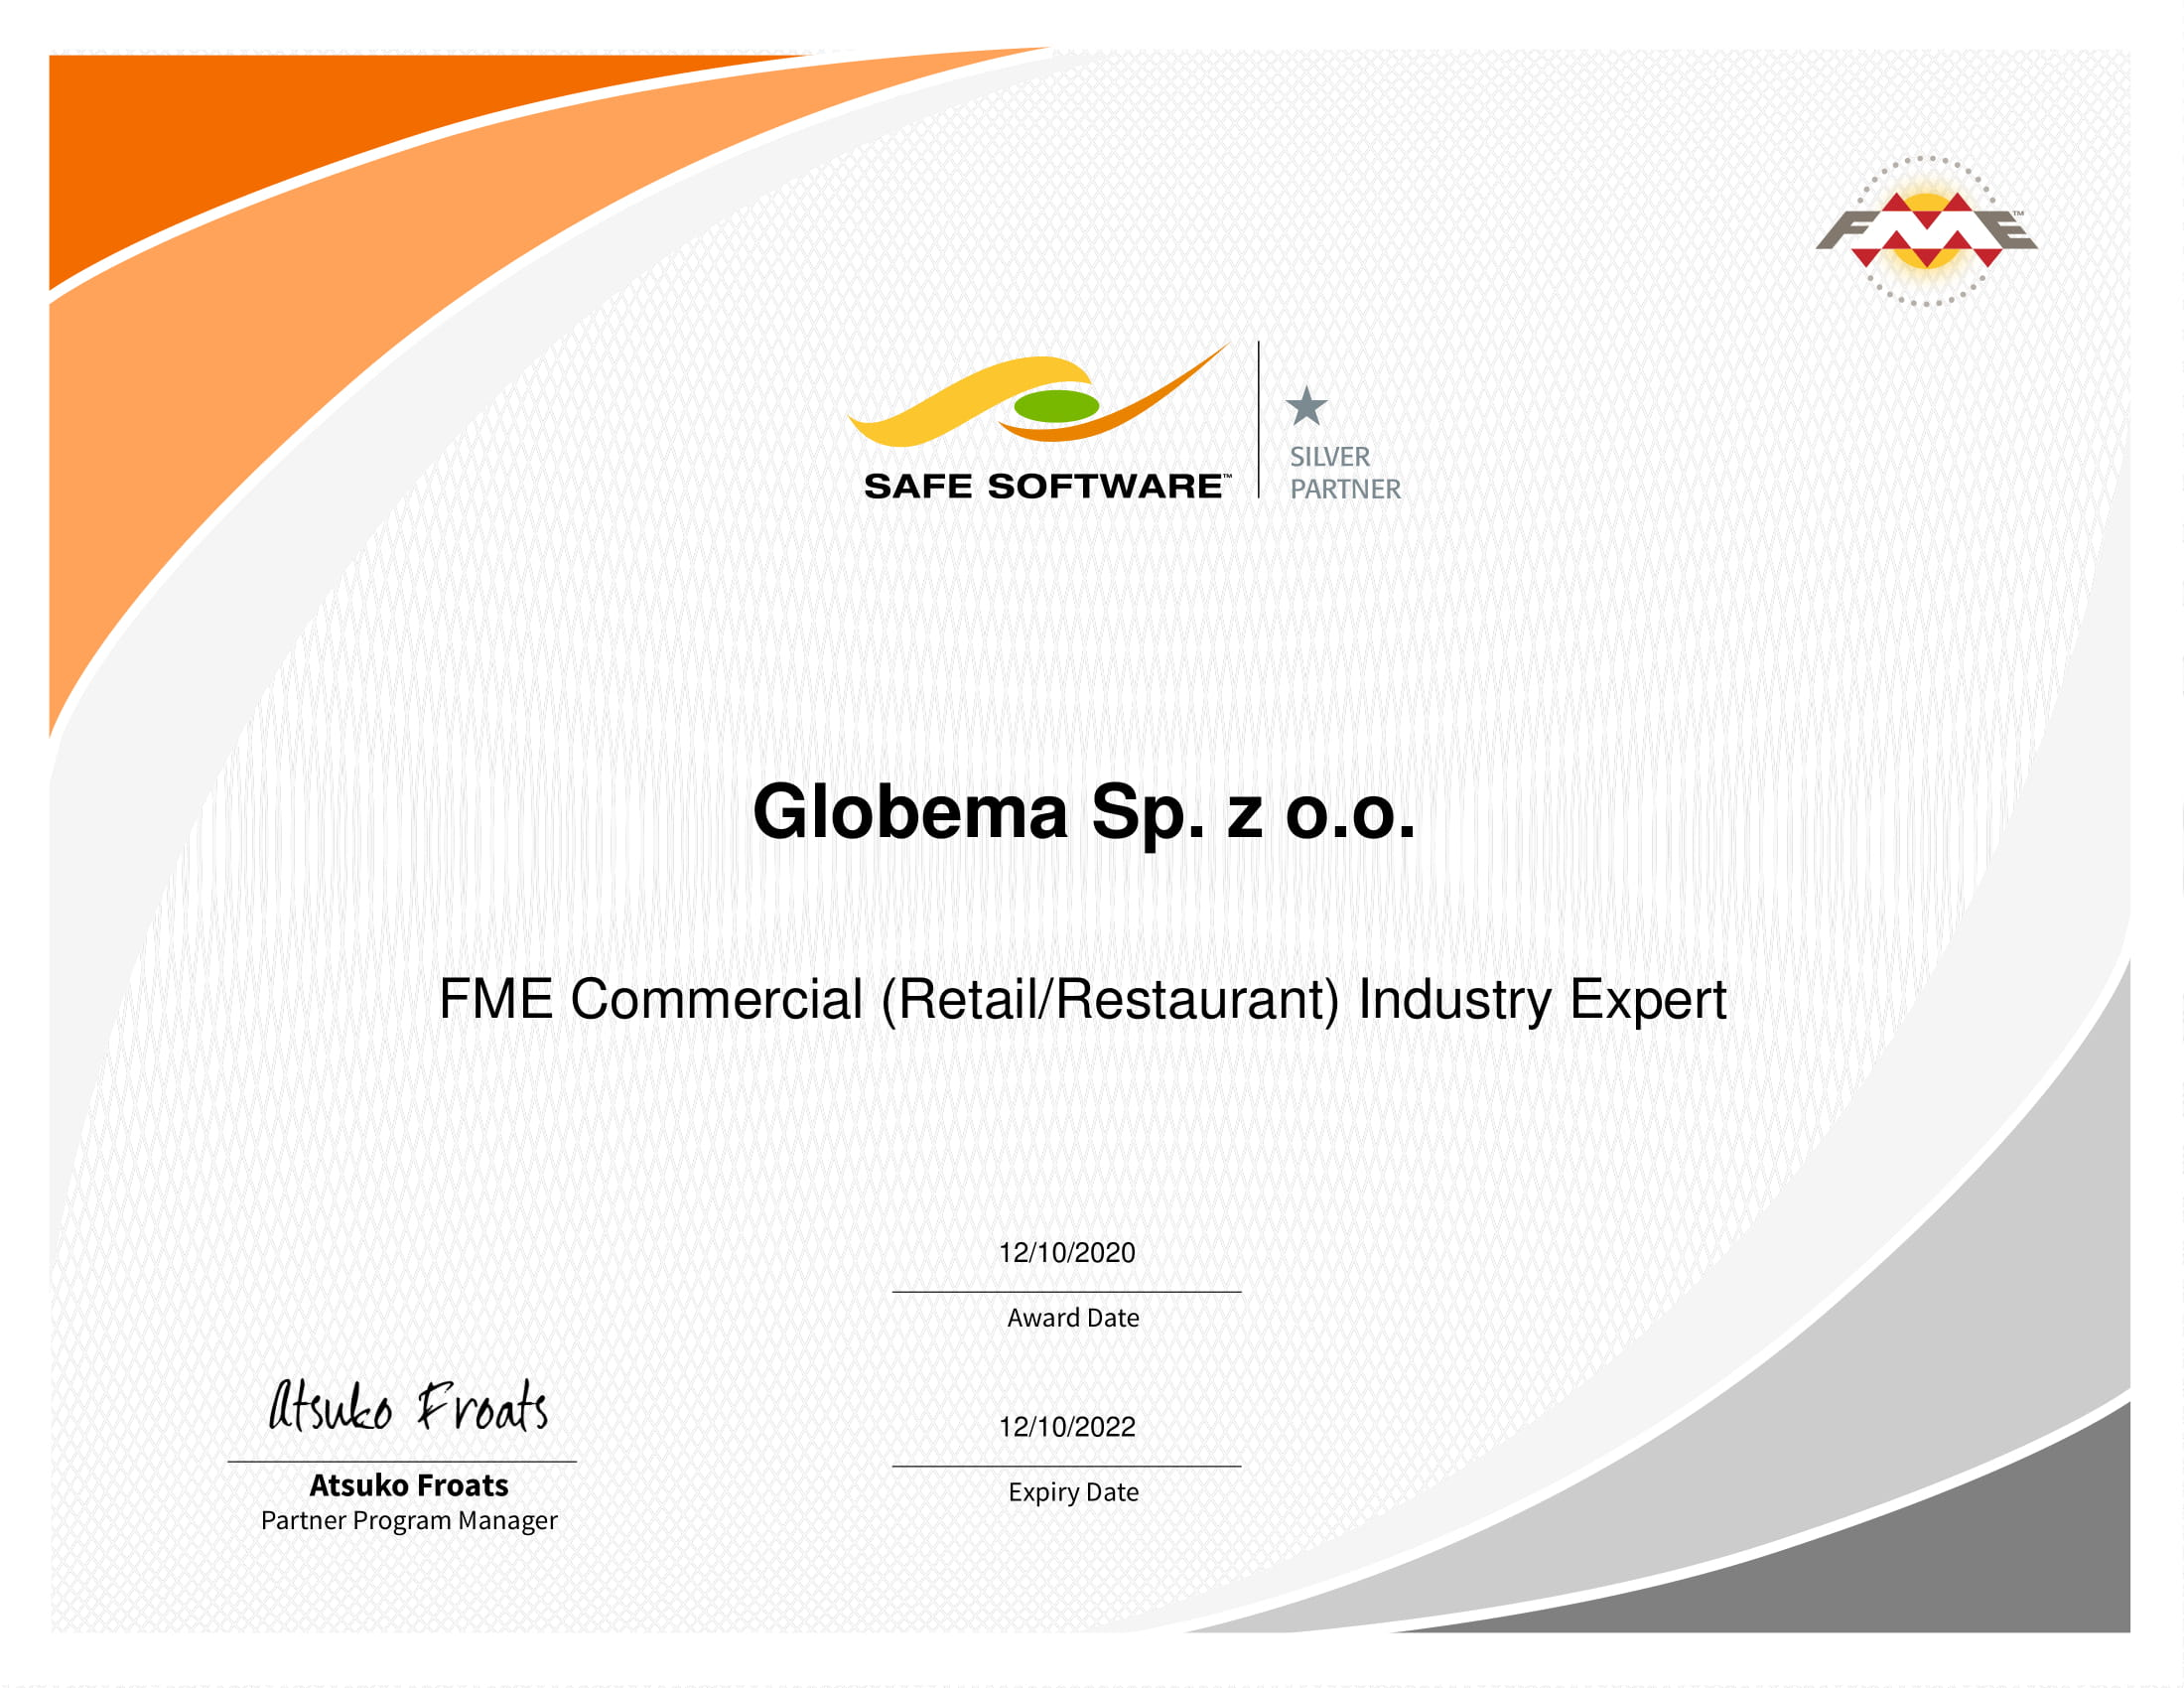 Globema - Commercial